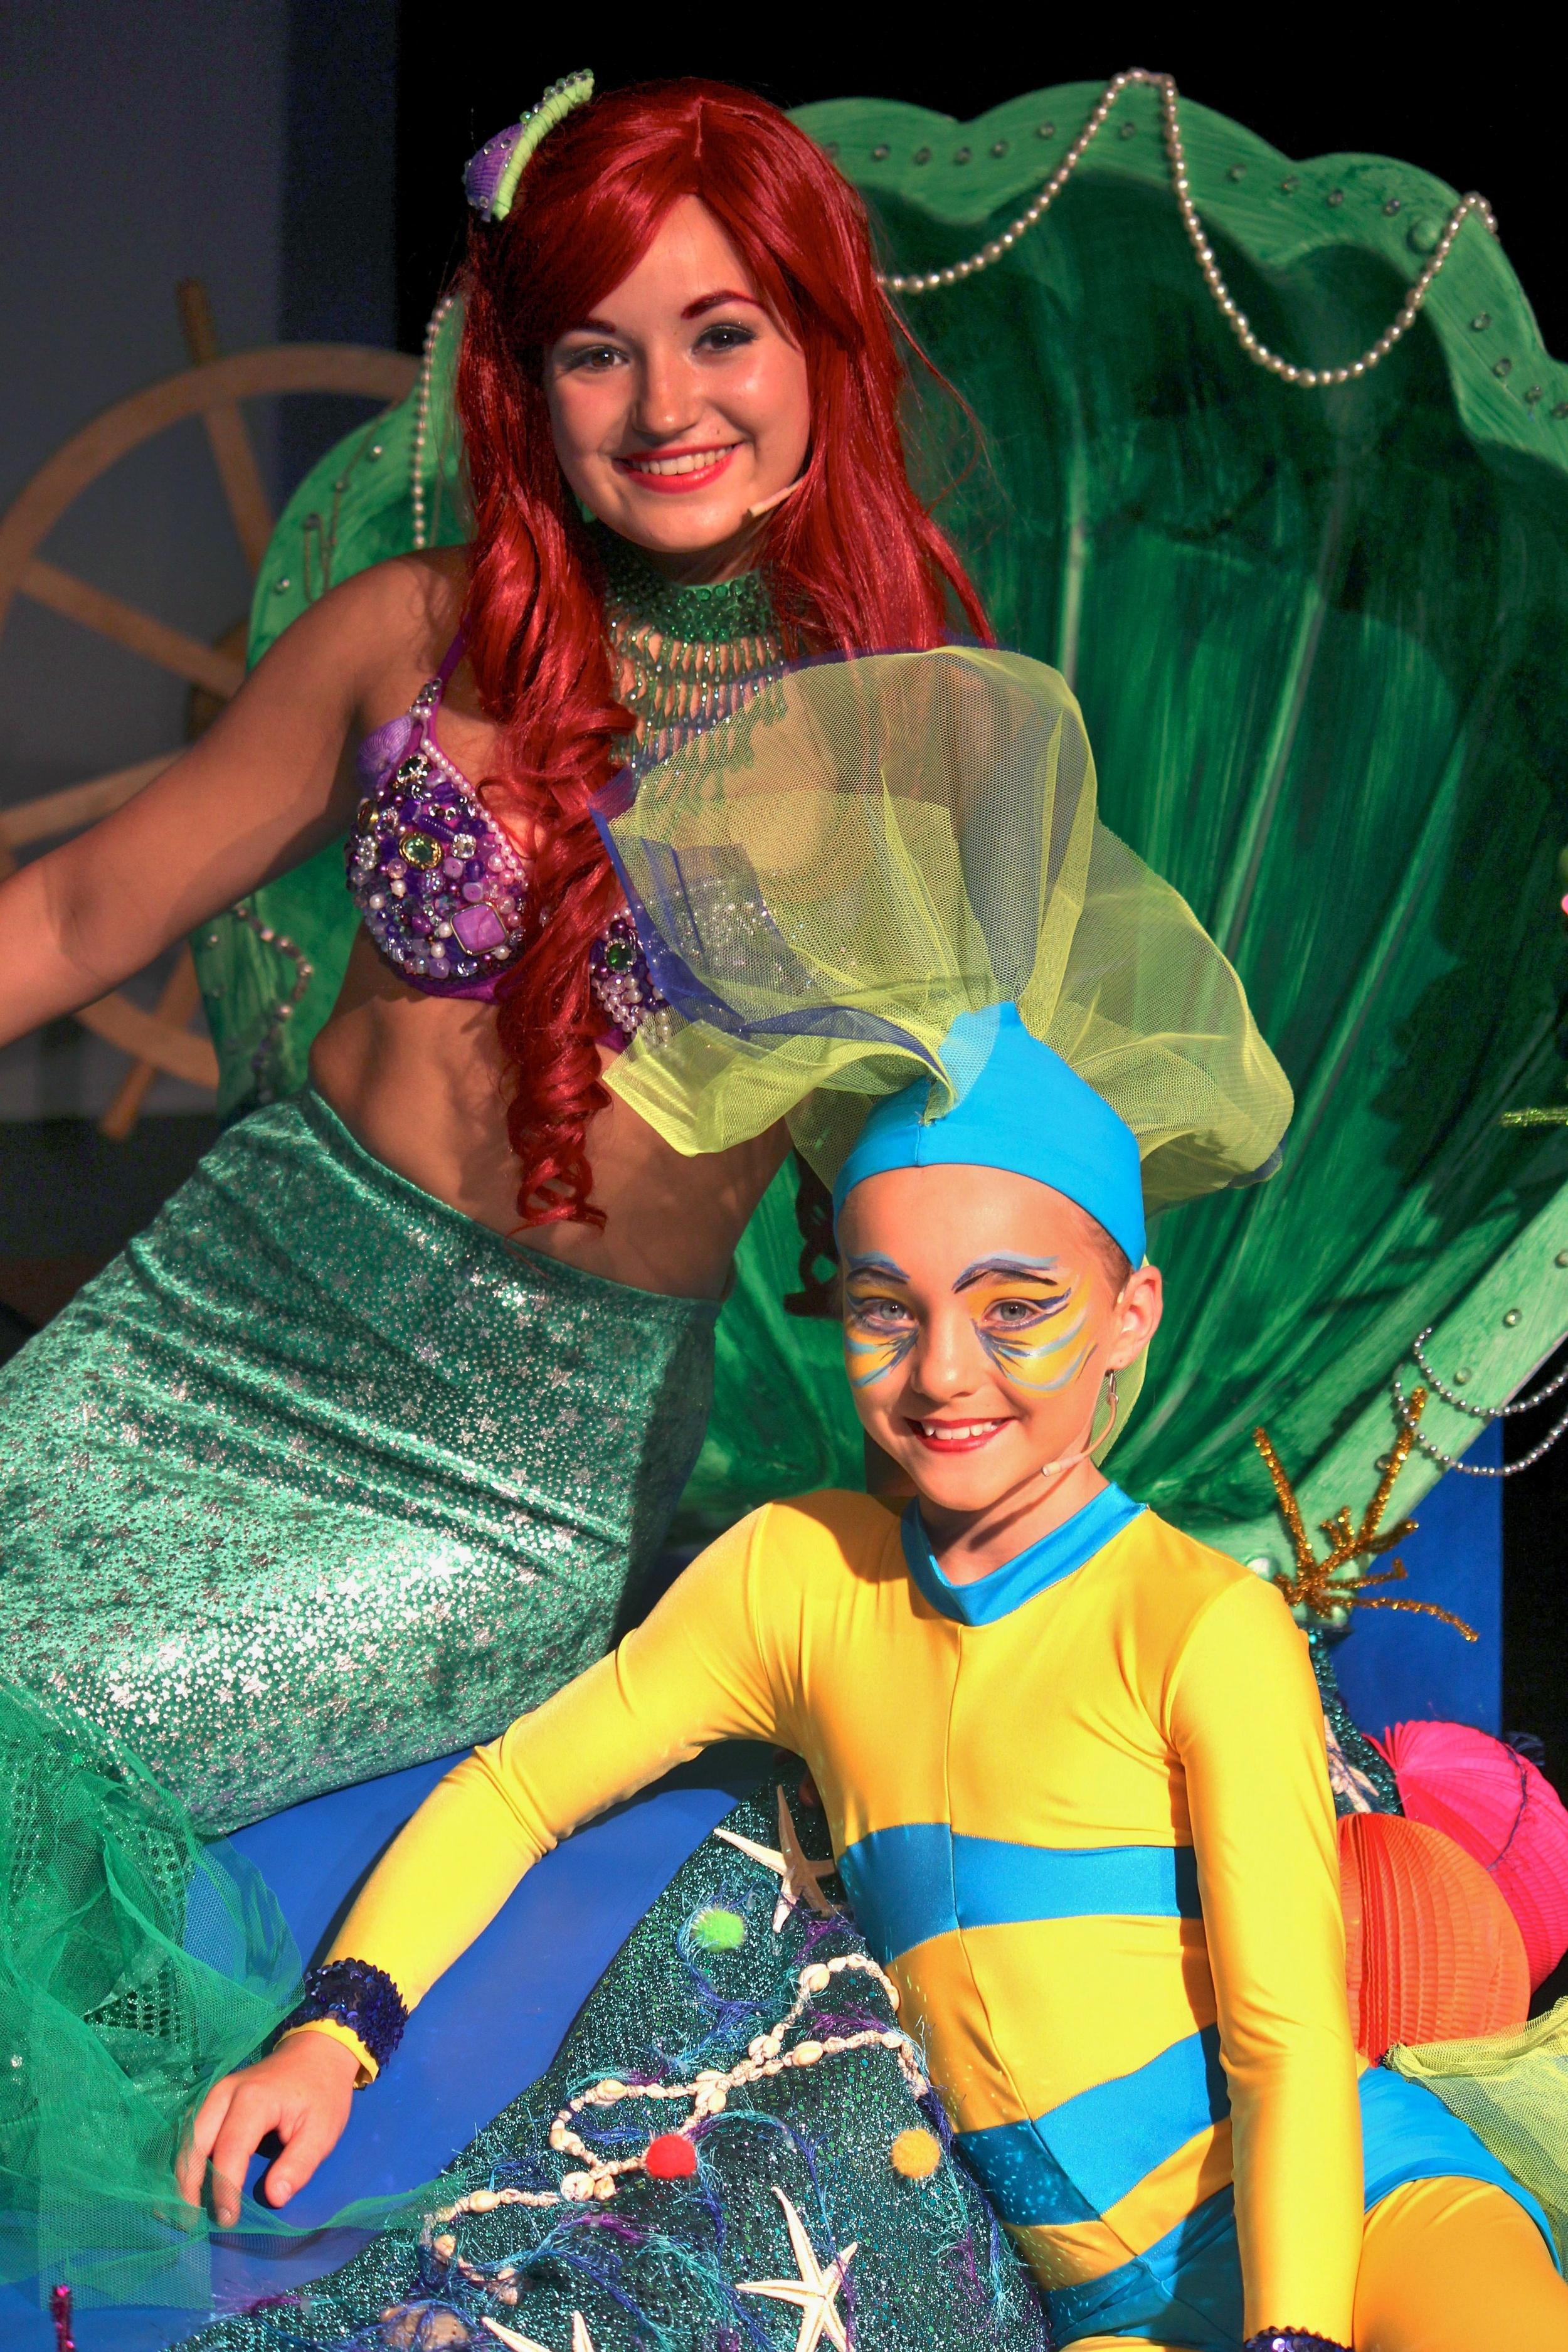 The Little Mermaid, 2013